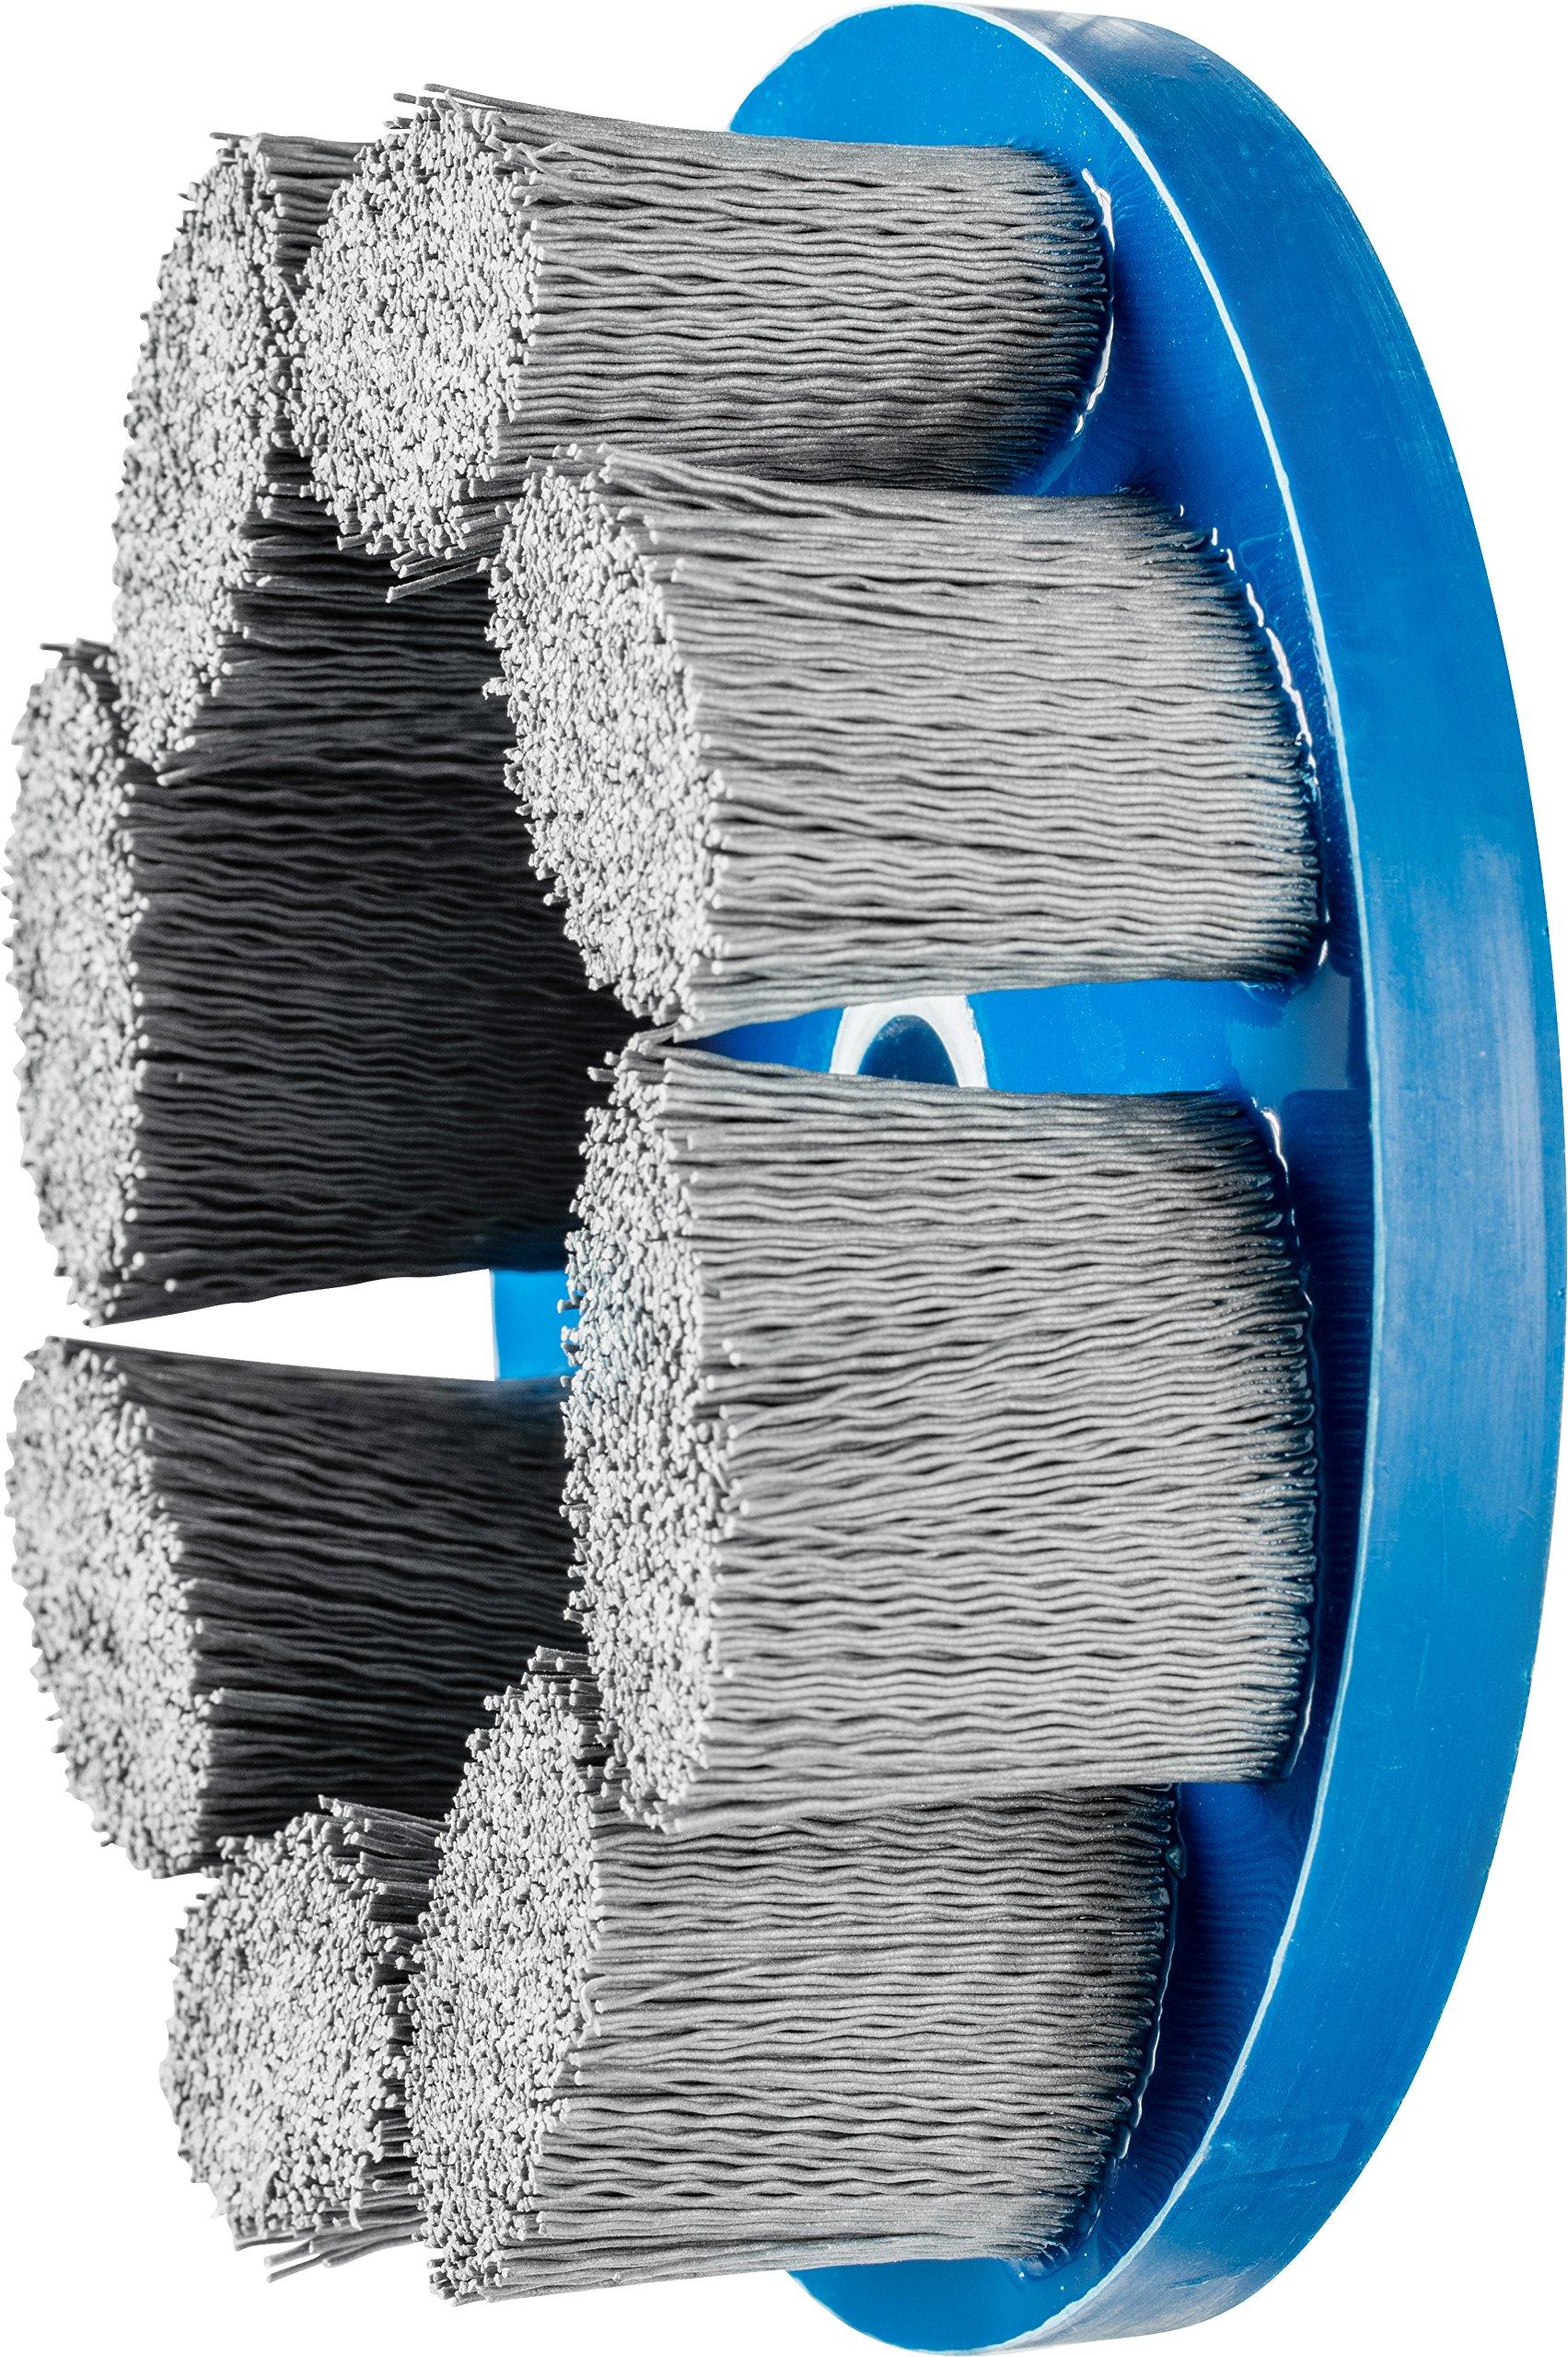 PFERD 83952 M-Brad Standard Density Composite Disc Brush, Silicon Carbide, 6'' Diameter, 0.022 Round Filament, 2500 rpm, 320 Grit